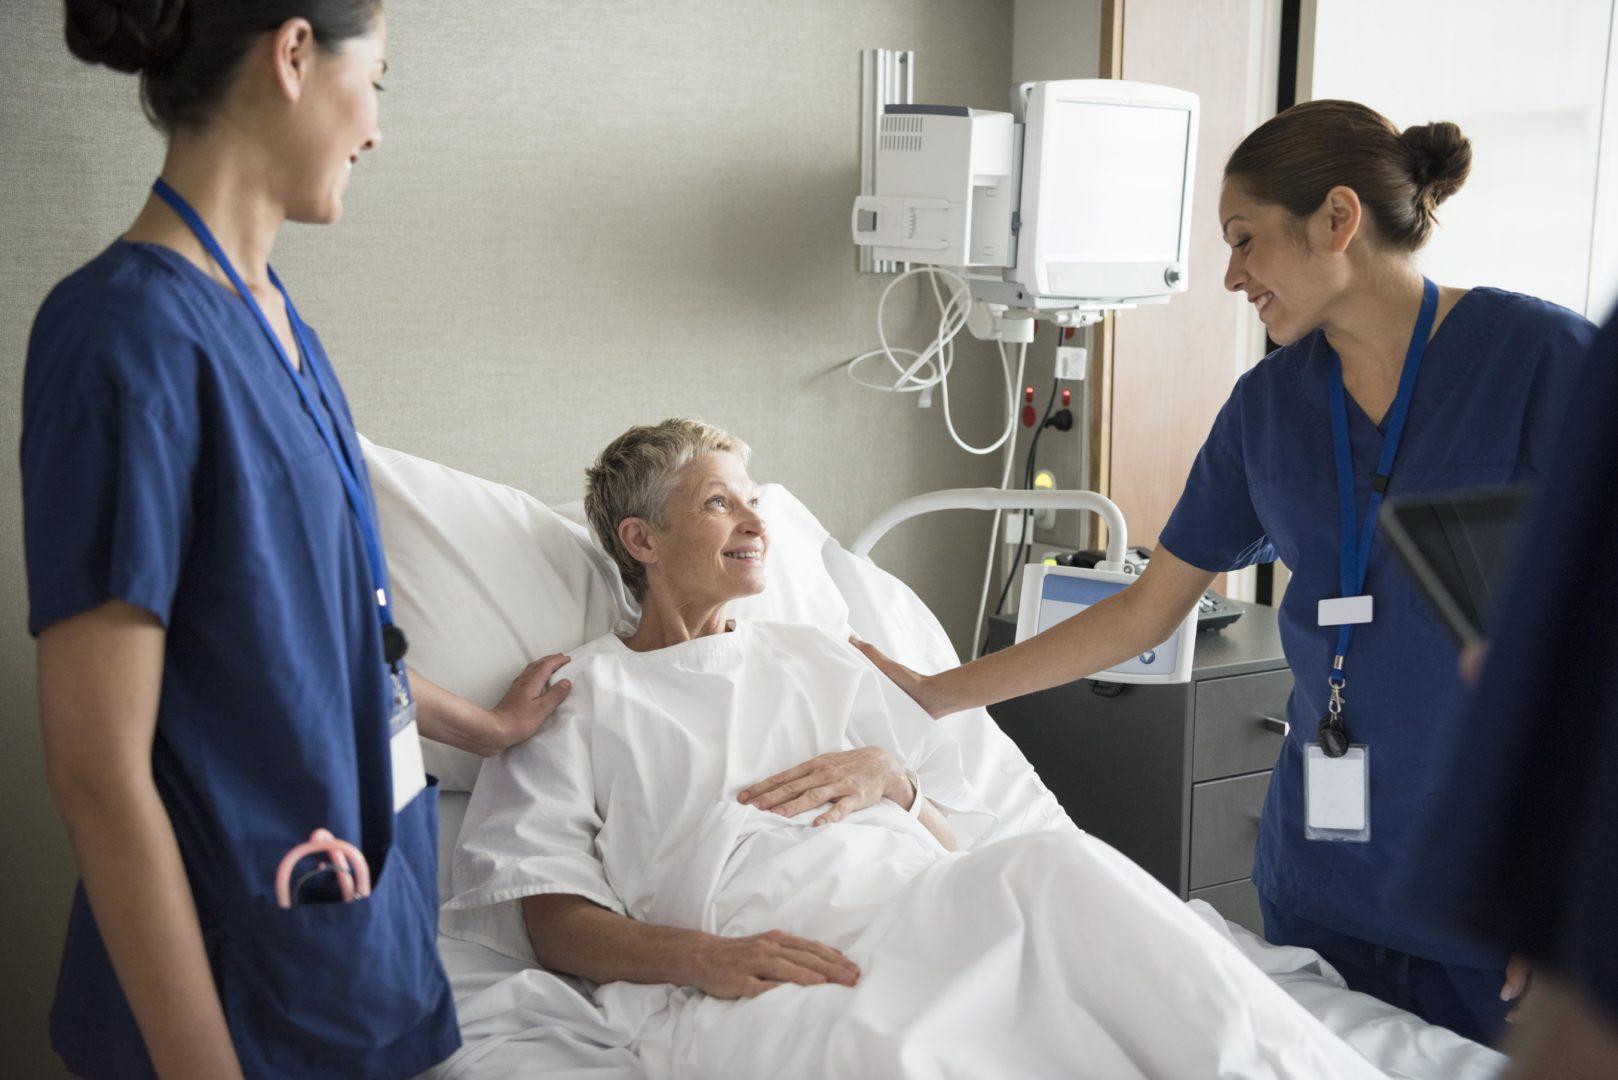 Clinicians at a patient bedside